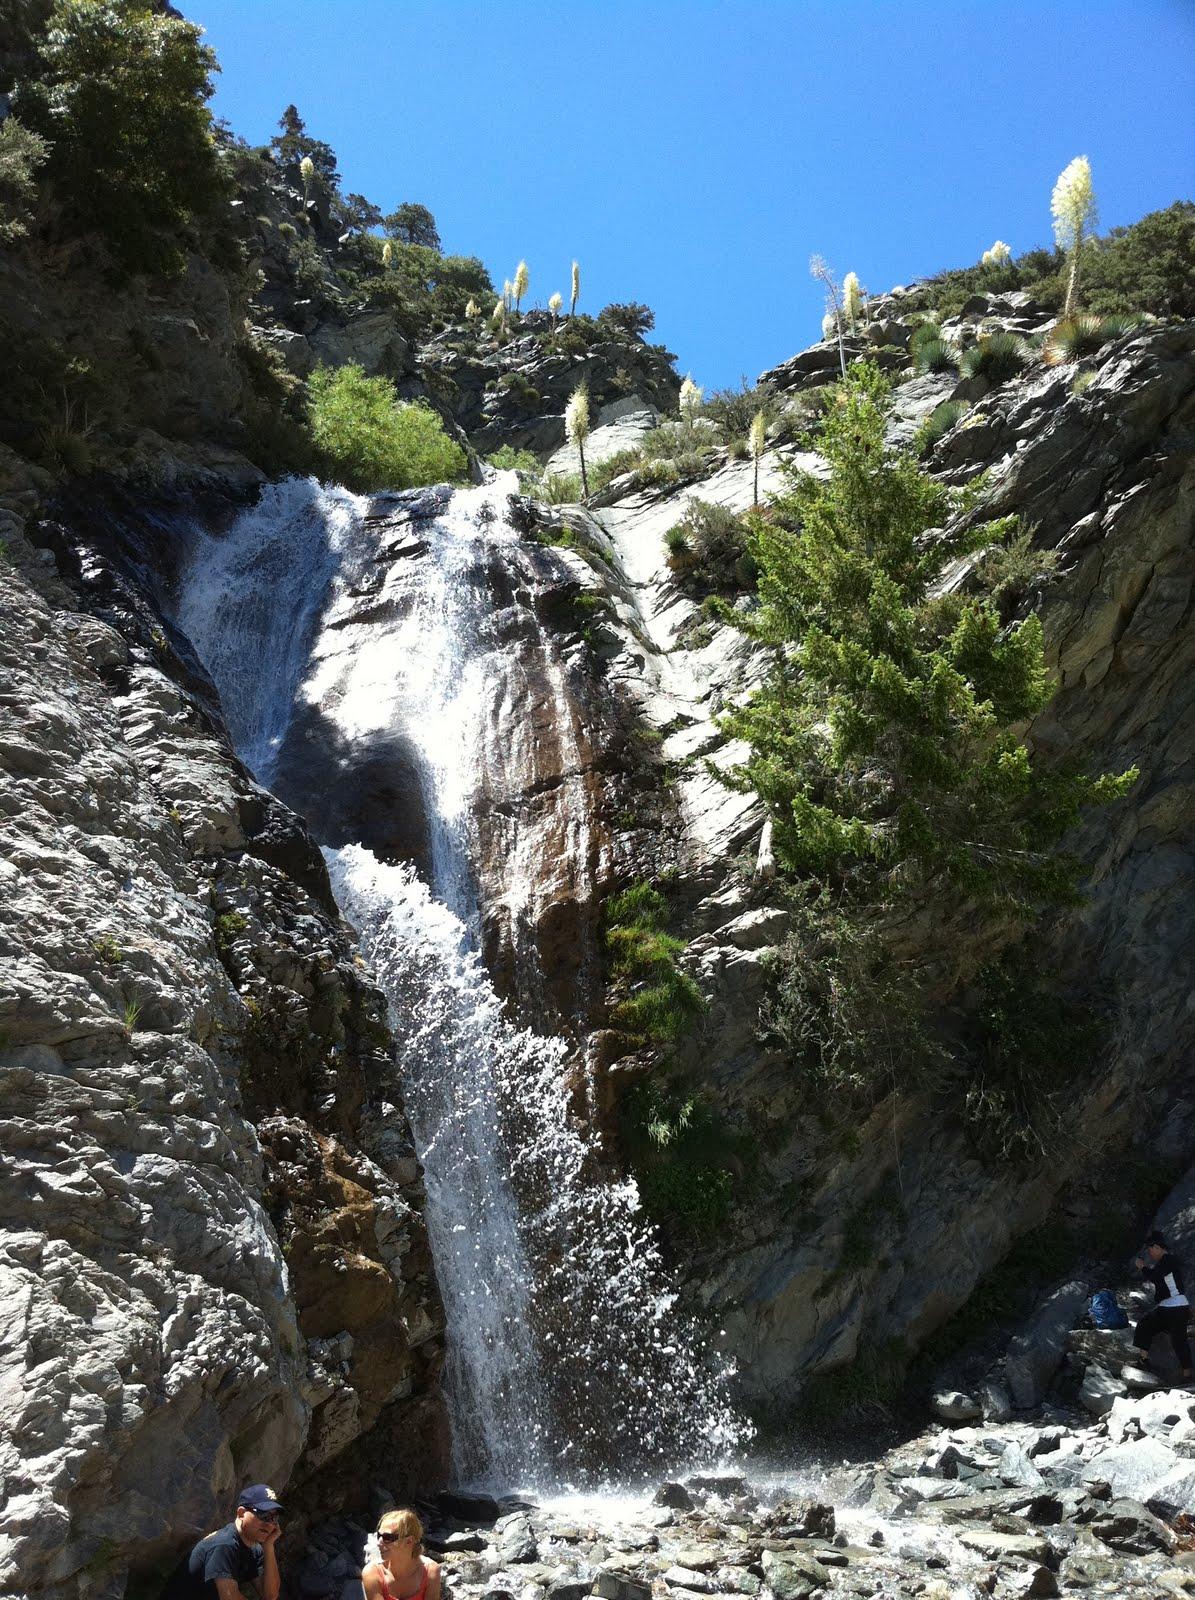 What S Joe Up To Hike To Top Of Mt Baldy Mt San Antonio